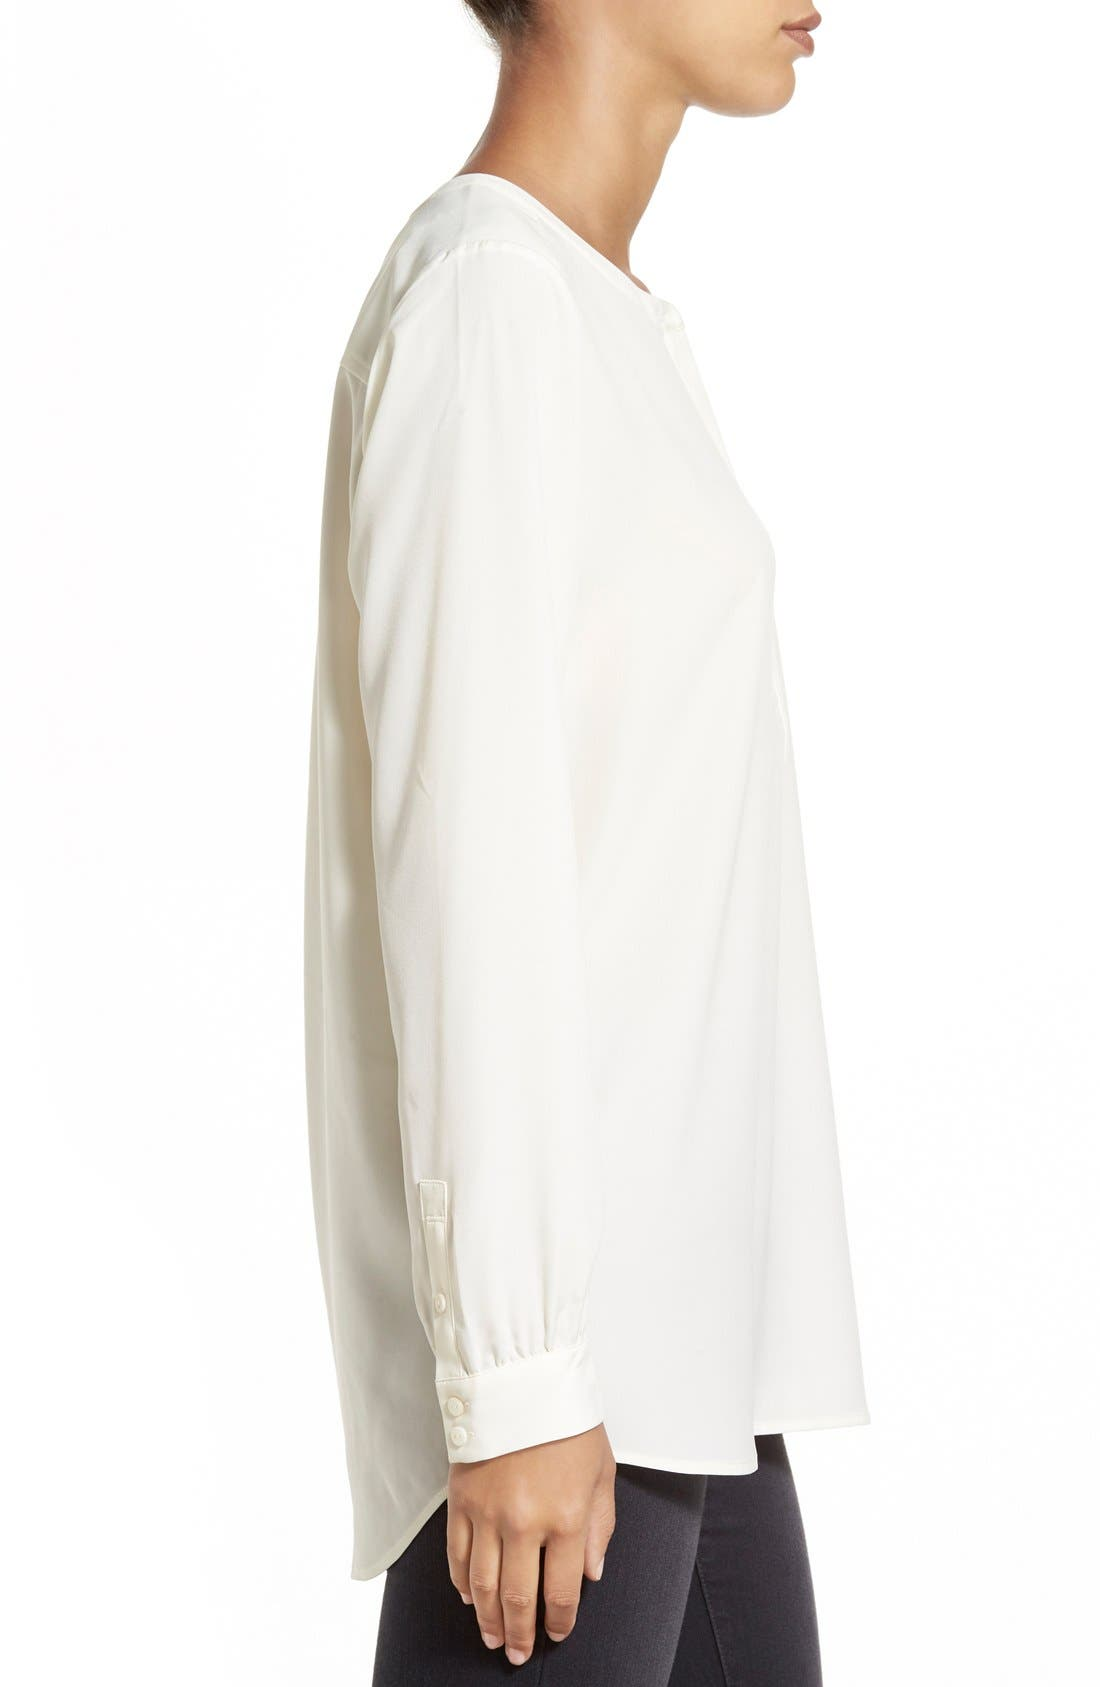 Alternate Image 3  - NYDJ Woven Tunic Top (Regular & Petite)